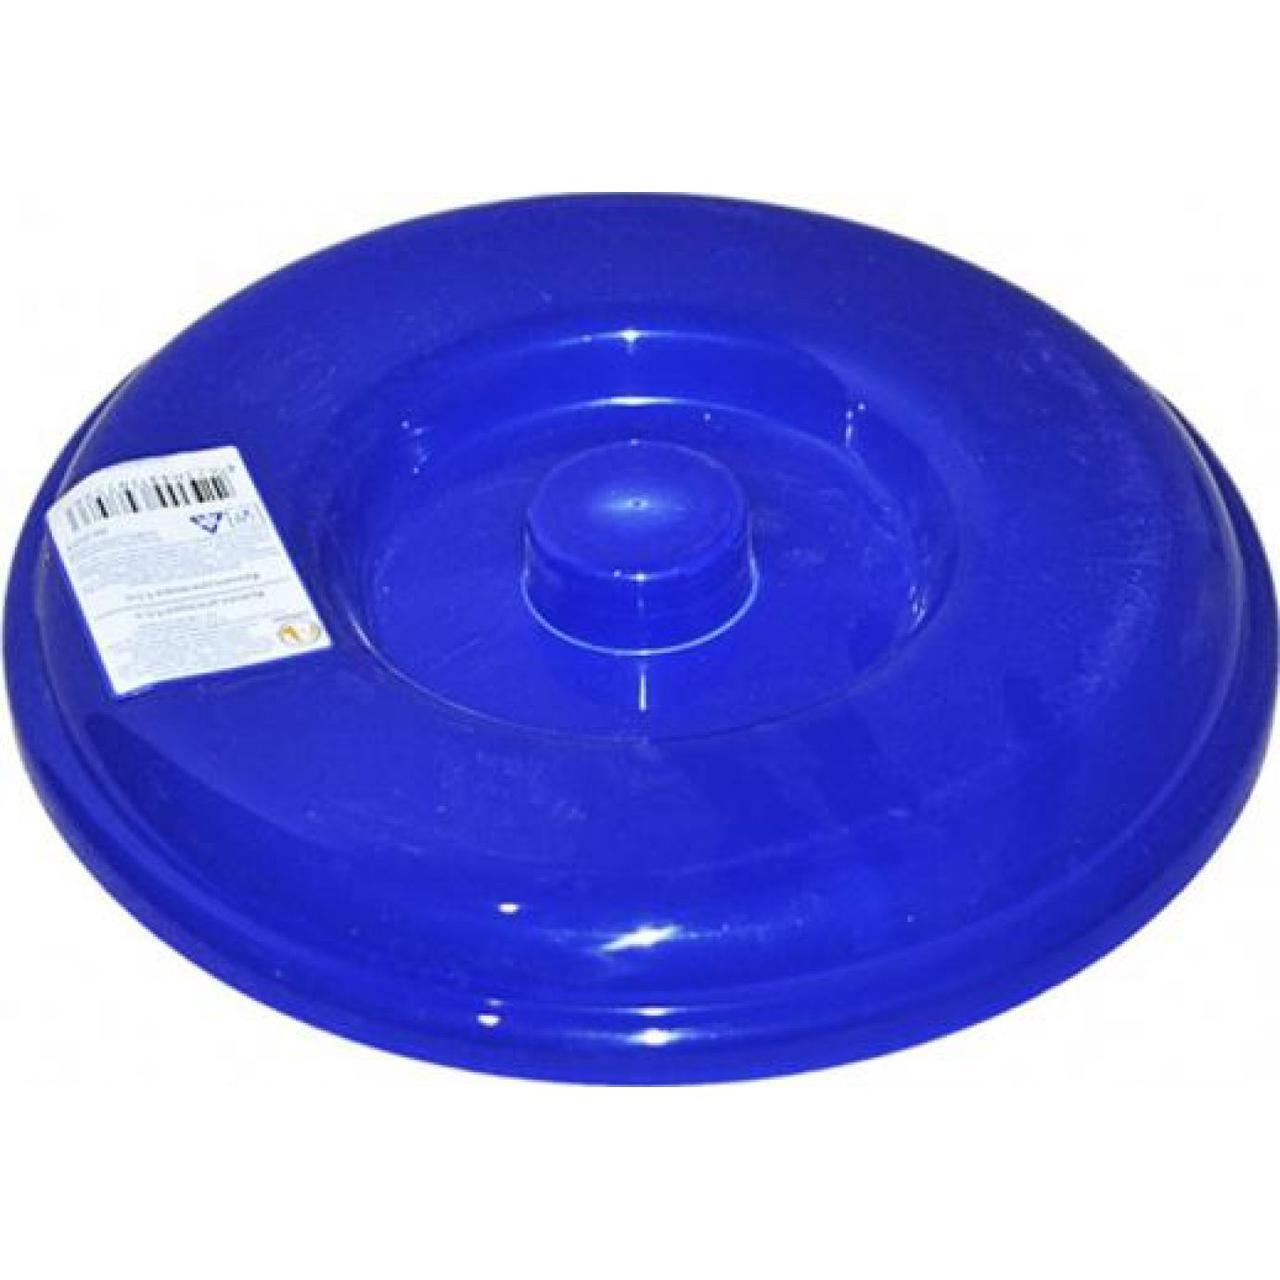 Крышка для ведра 5л Алеана синяя 122031 (15)